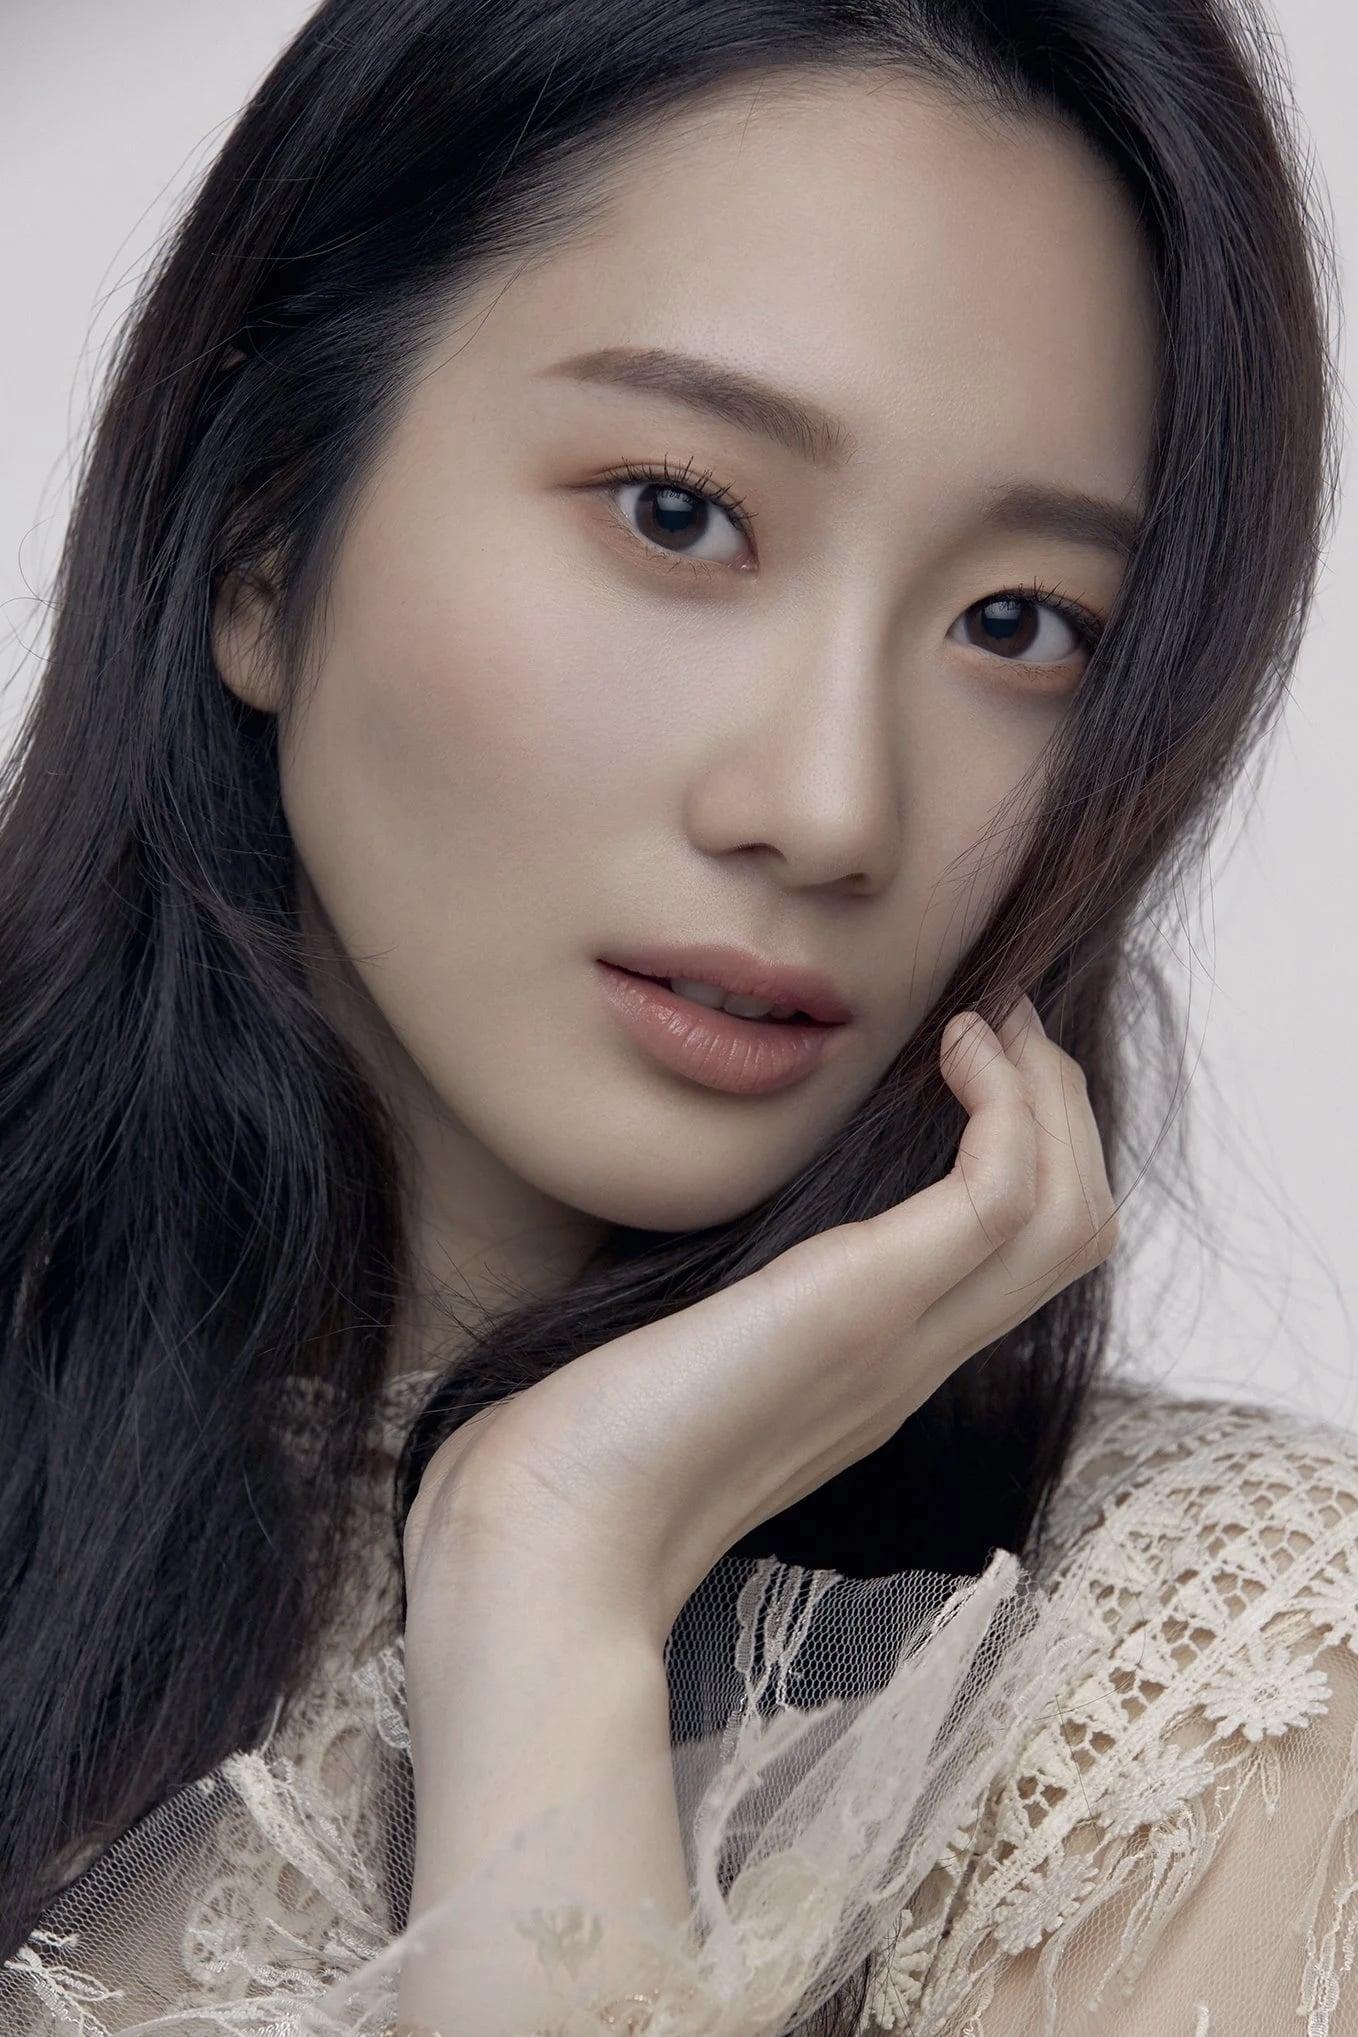 Chae Seo-eun